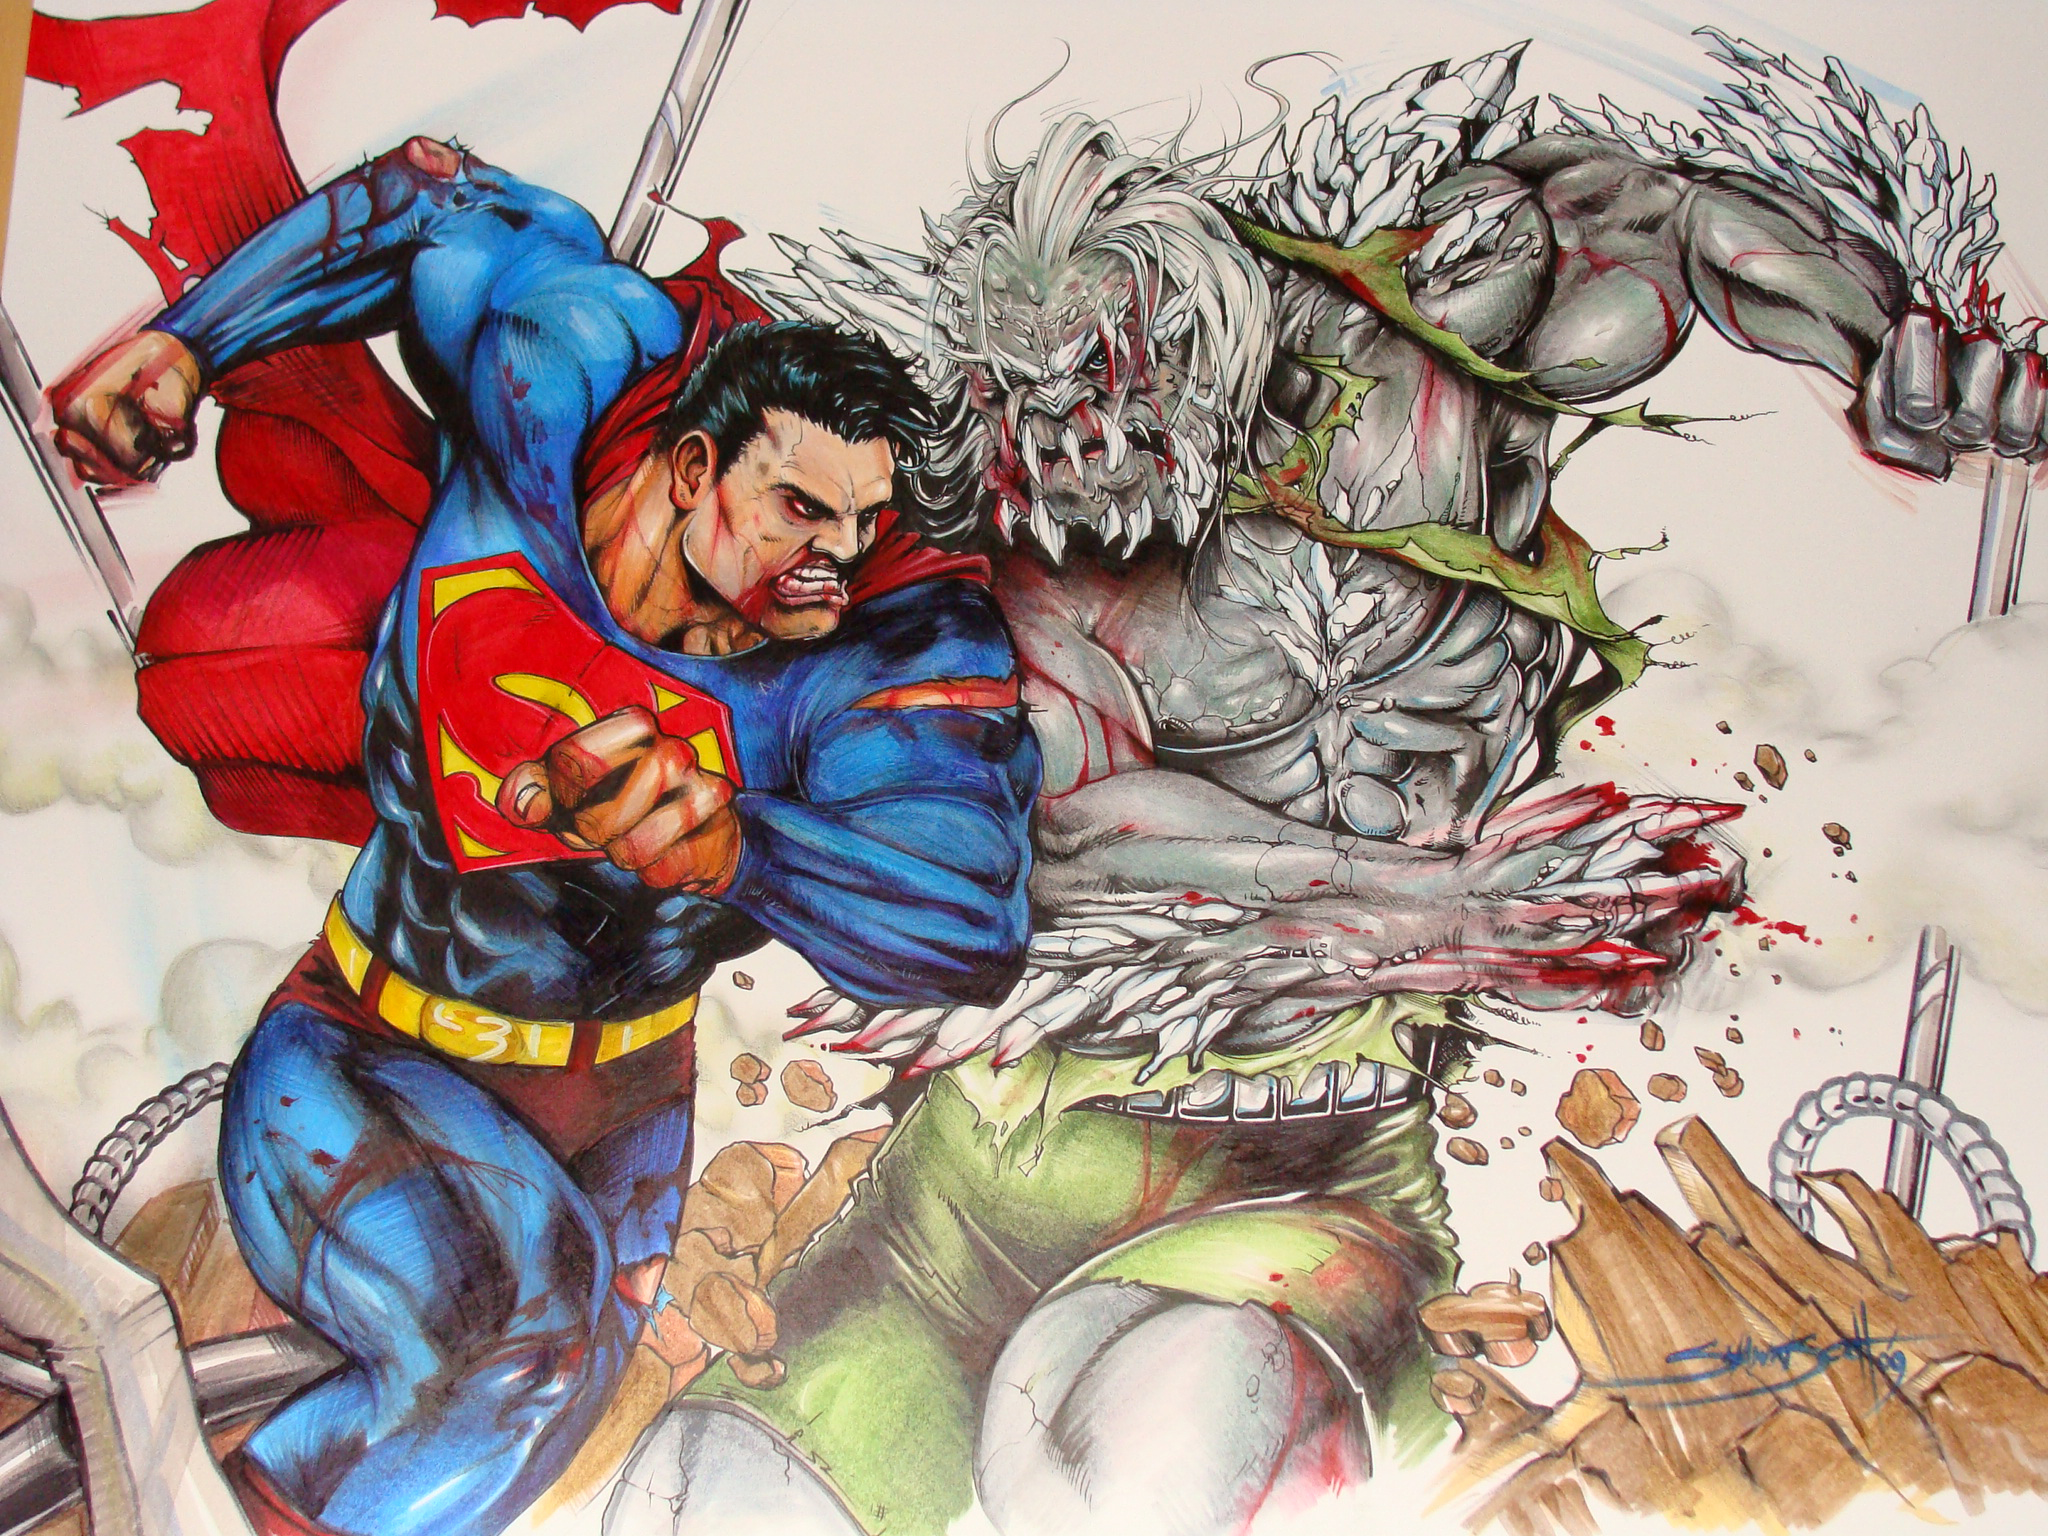 Most Inspiring Wallpaper Mac Superhero - Doomsday-vs-Superman-Wallpaper  Trends_95943.jpg